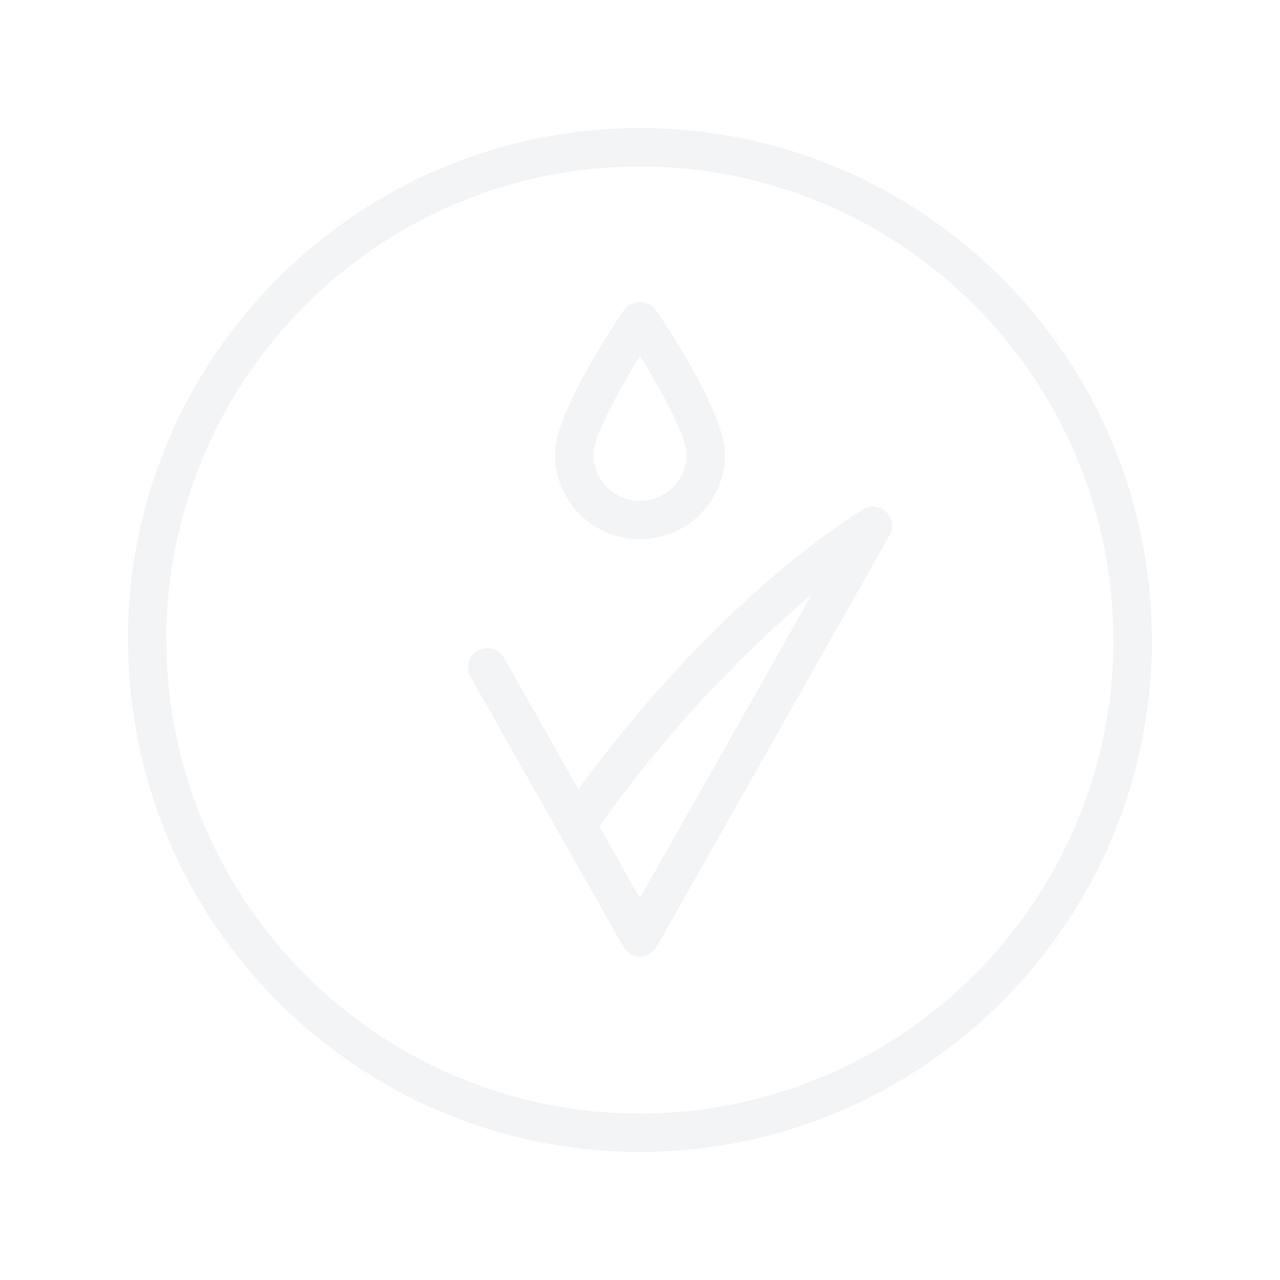 JUVENA Skin Energy Pore Refine Mat Fluid 50ml